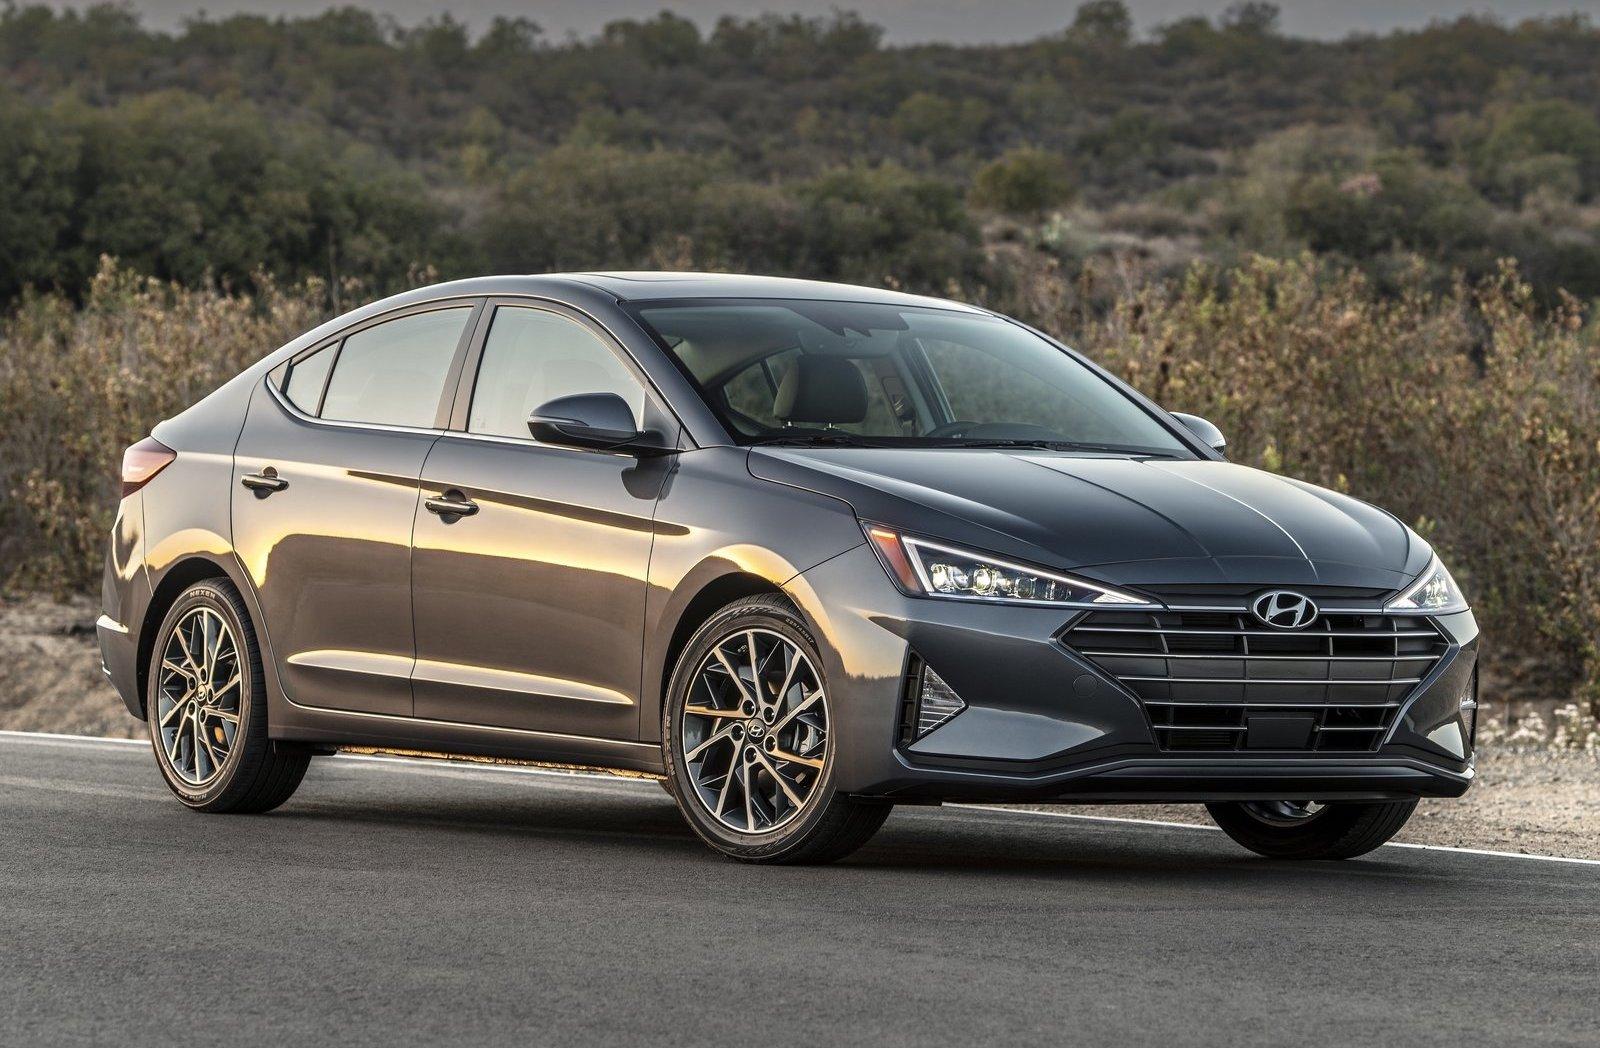 2019 Hyundai Elantra Revealed In North America